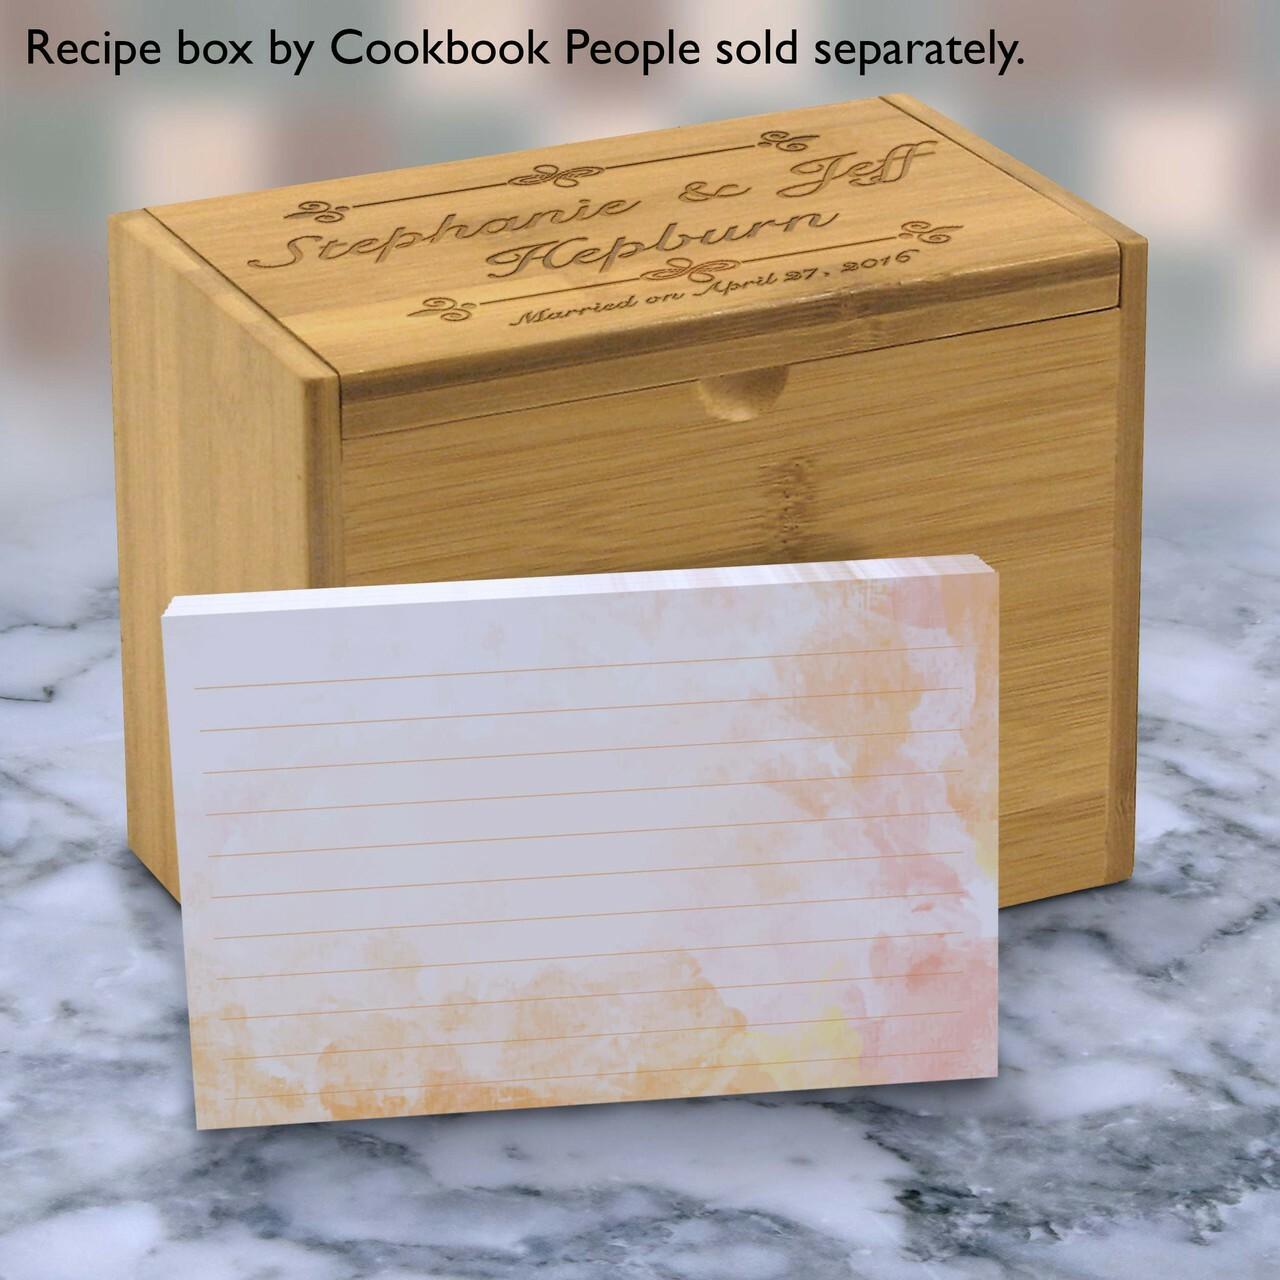 index card recipe book - Lokas australianuniversities co